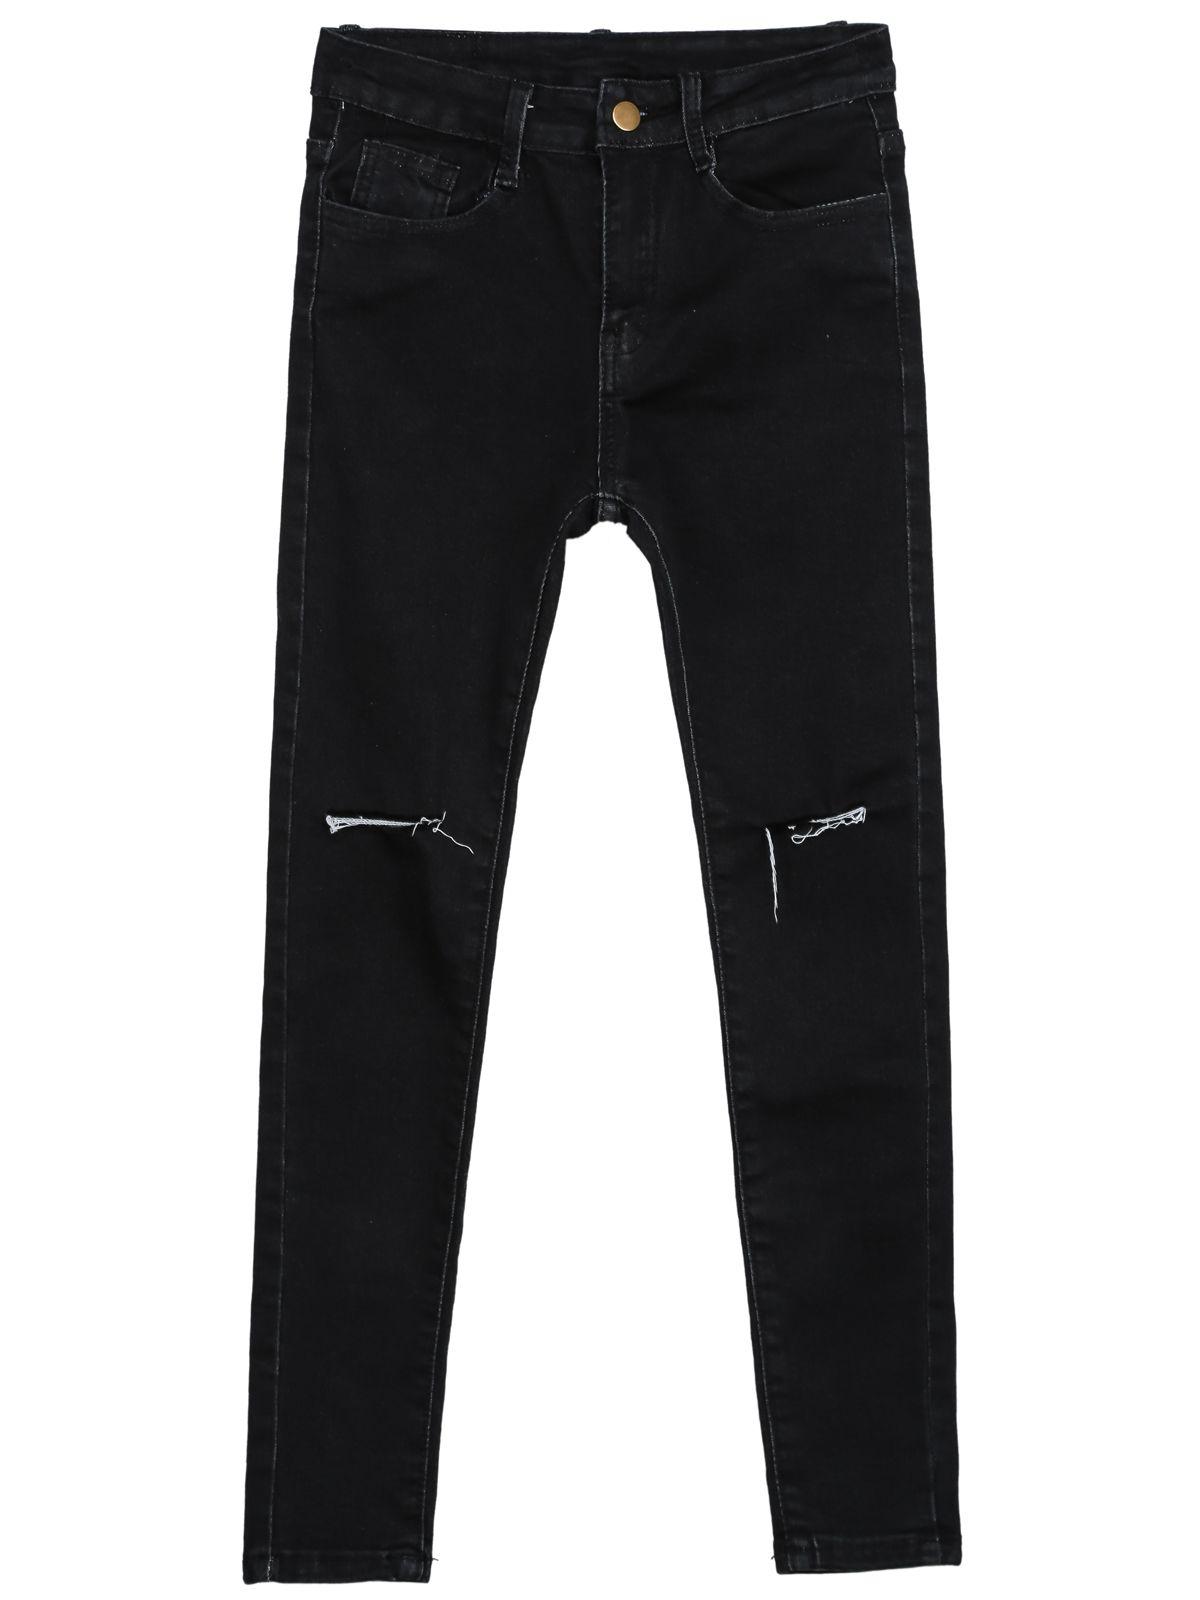 Black Slim Ripped Pockets Denim Pant 19.00 http://www.sheinside.com/Black-Slim-Ripped-Pockets-Denim-Pant-p-183740-cat-1740.html?aff_id=2416